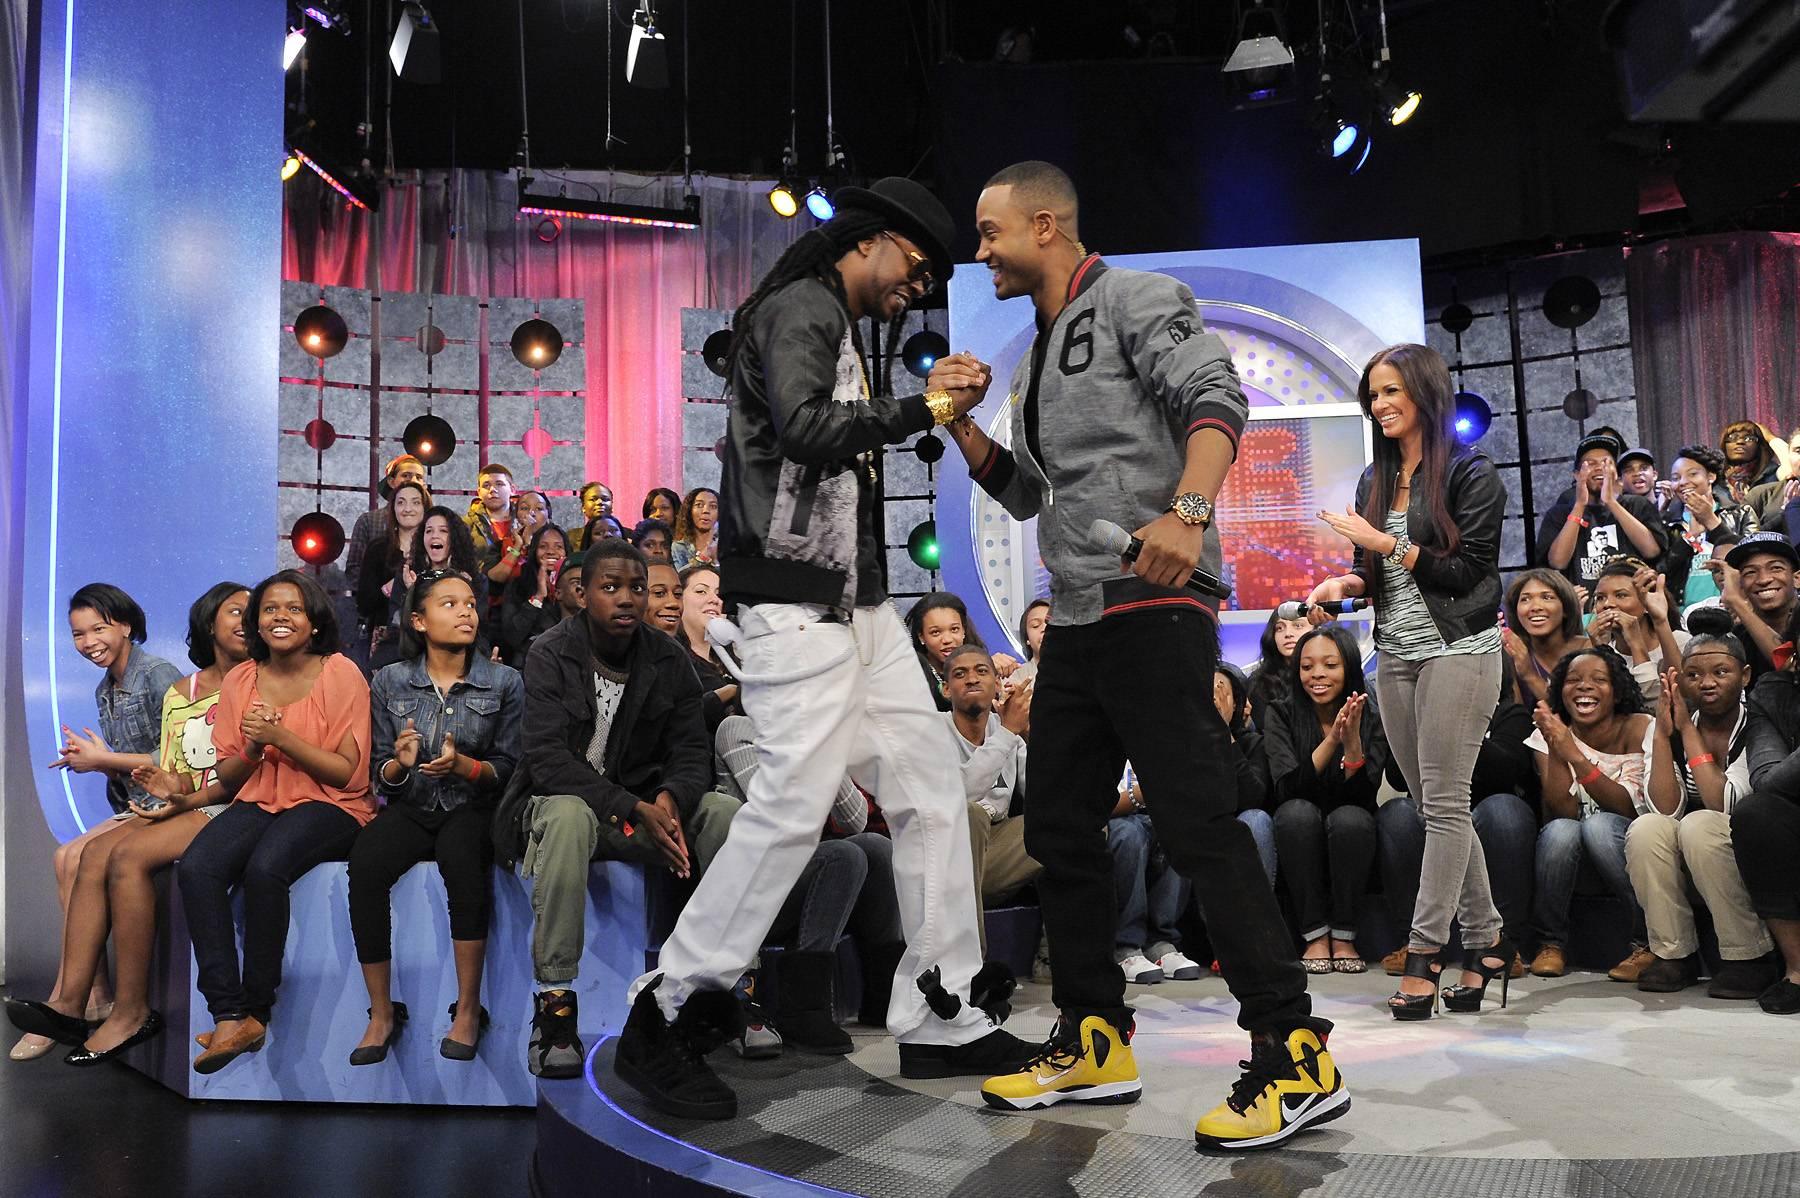 What's Good - 2 Chainz enters the set at 106 & Park, April 9, 2012. (photo: John Ricard / BET)